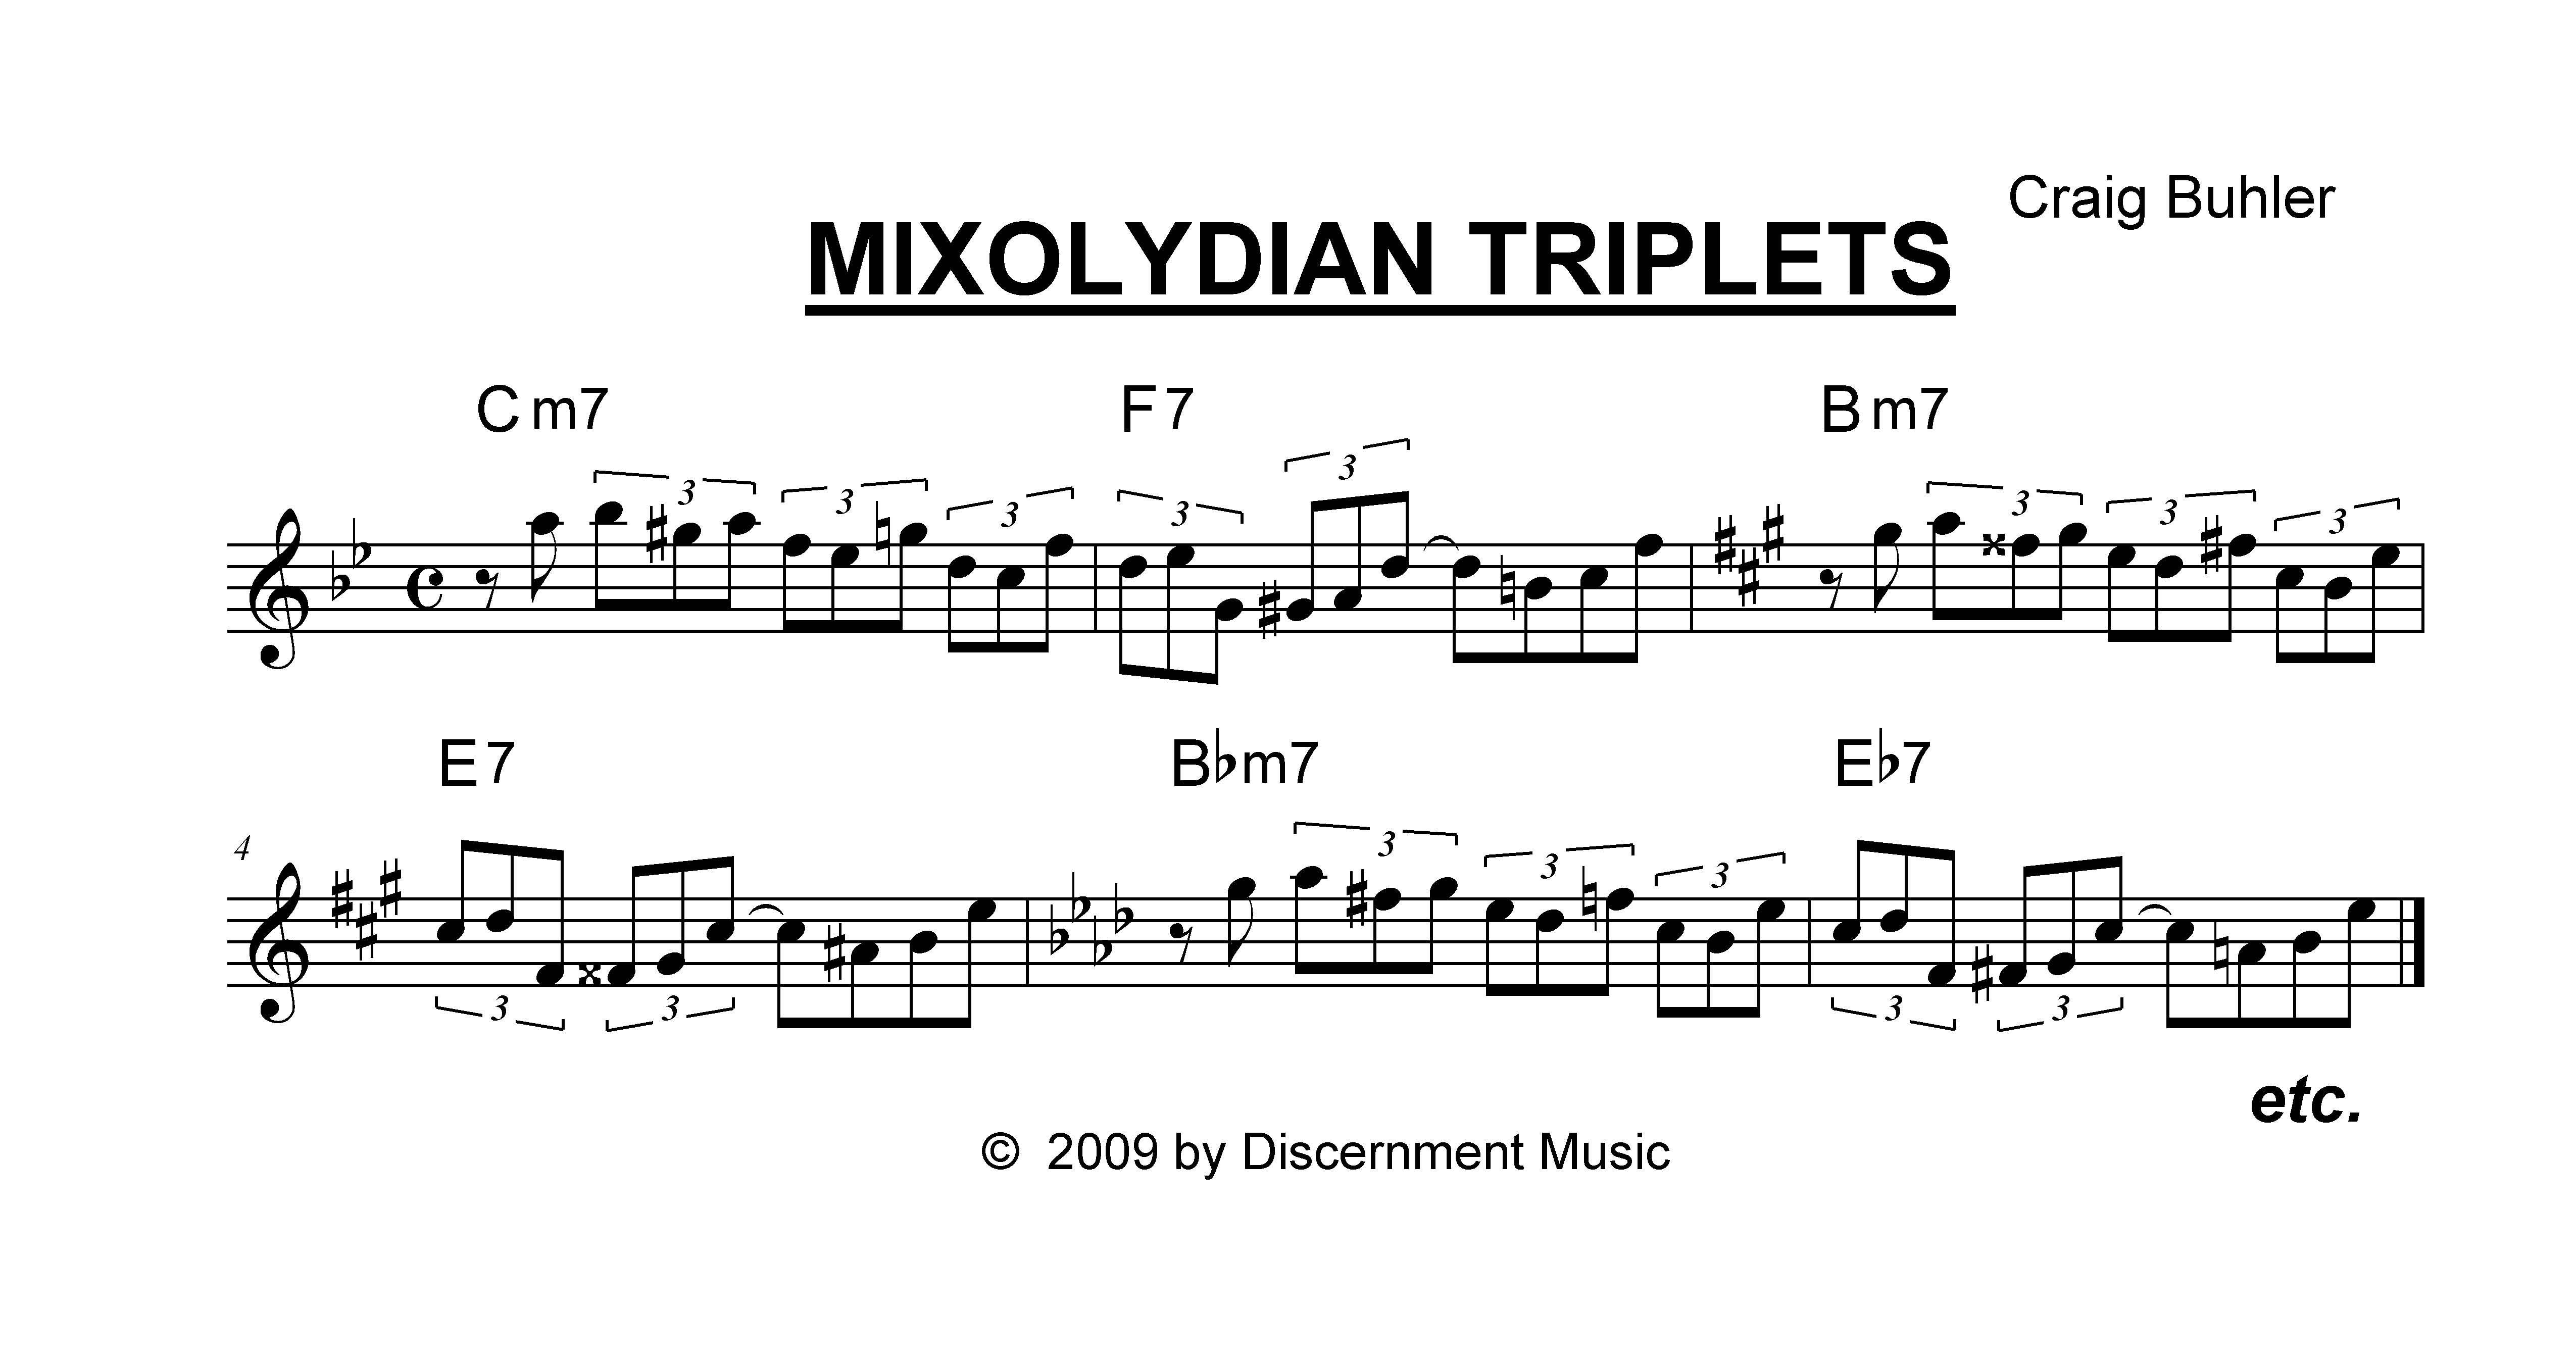 Ii V Progressions Chords Mixolydian Triplets